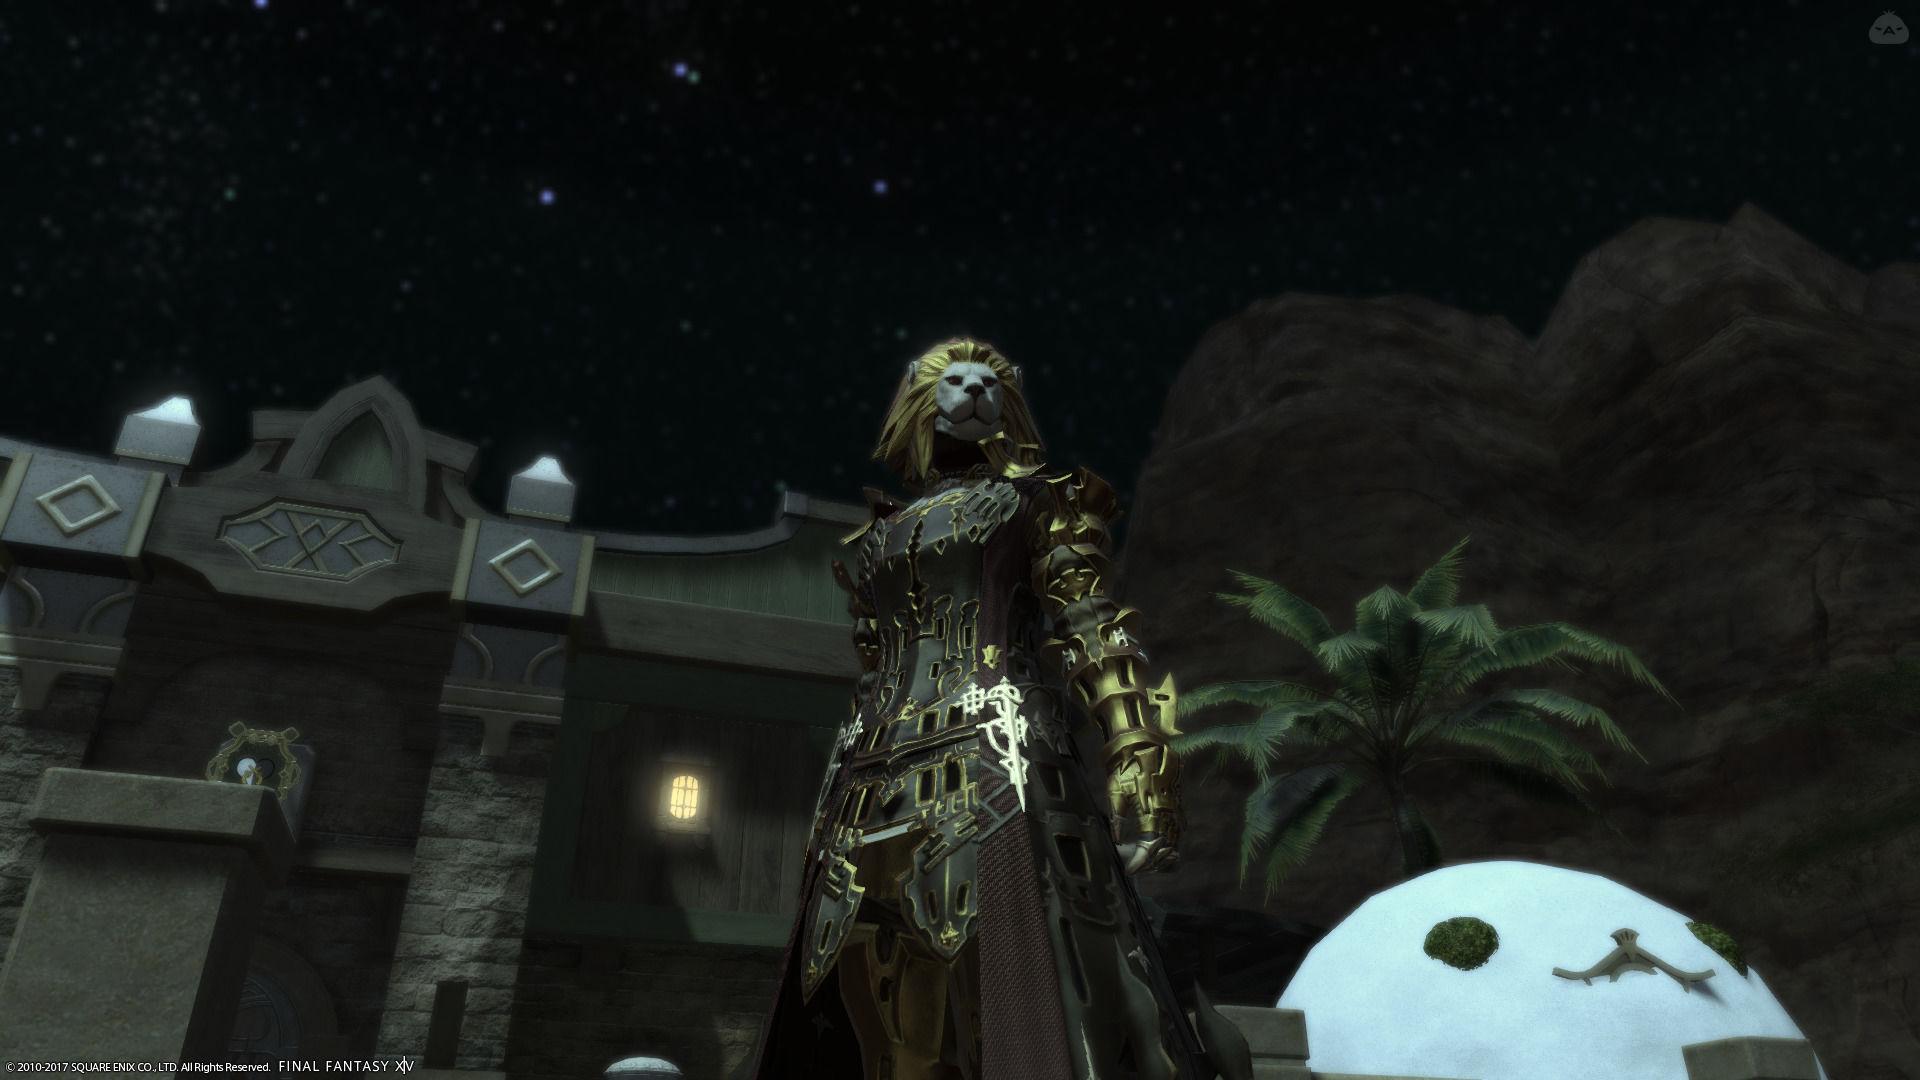 黄金の魔戒騎士・・・?